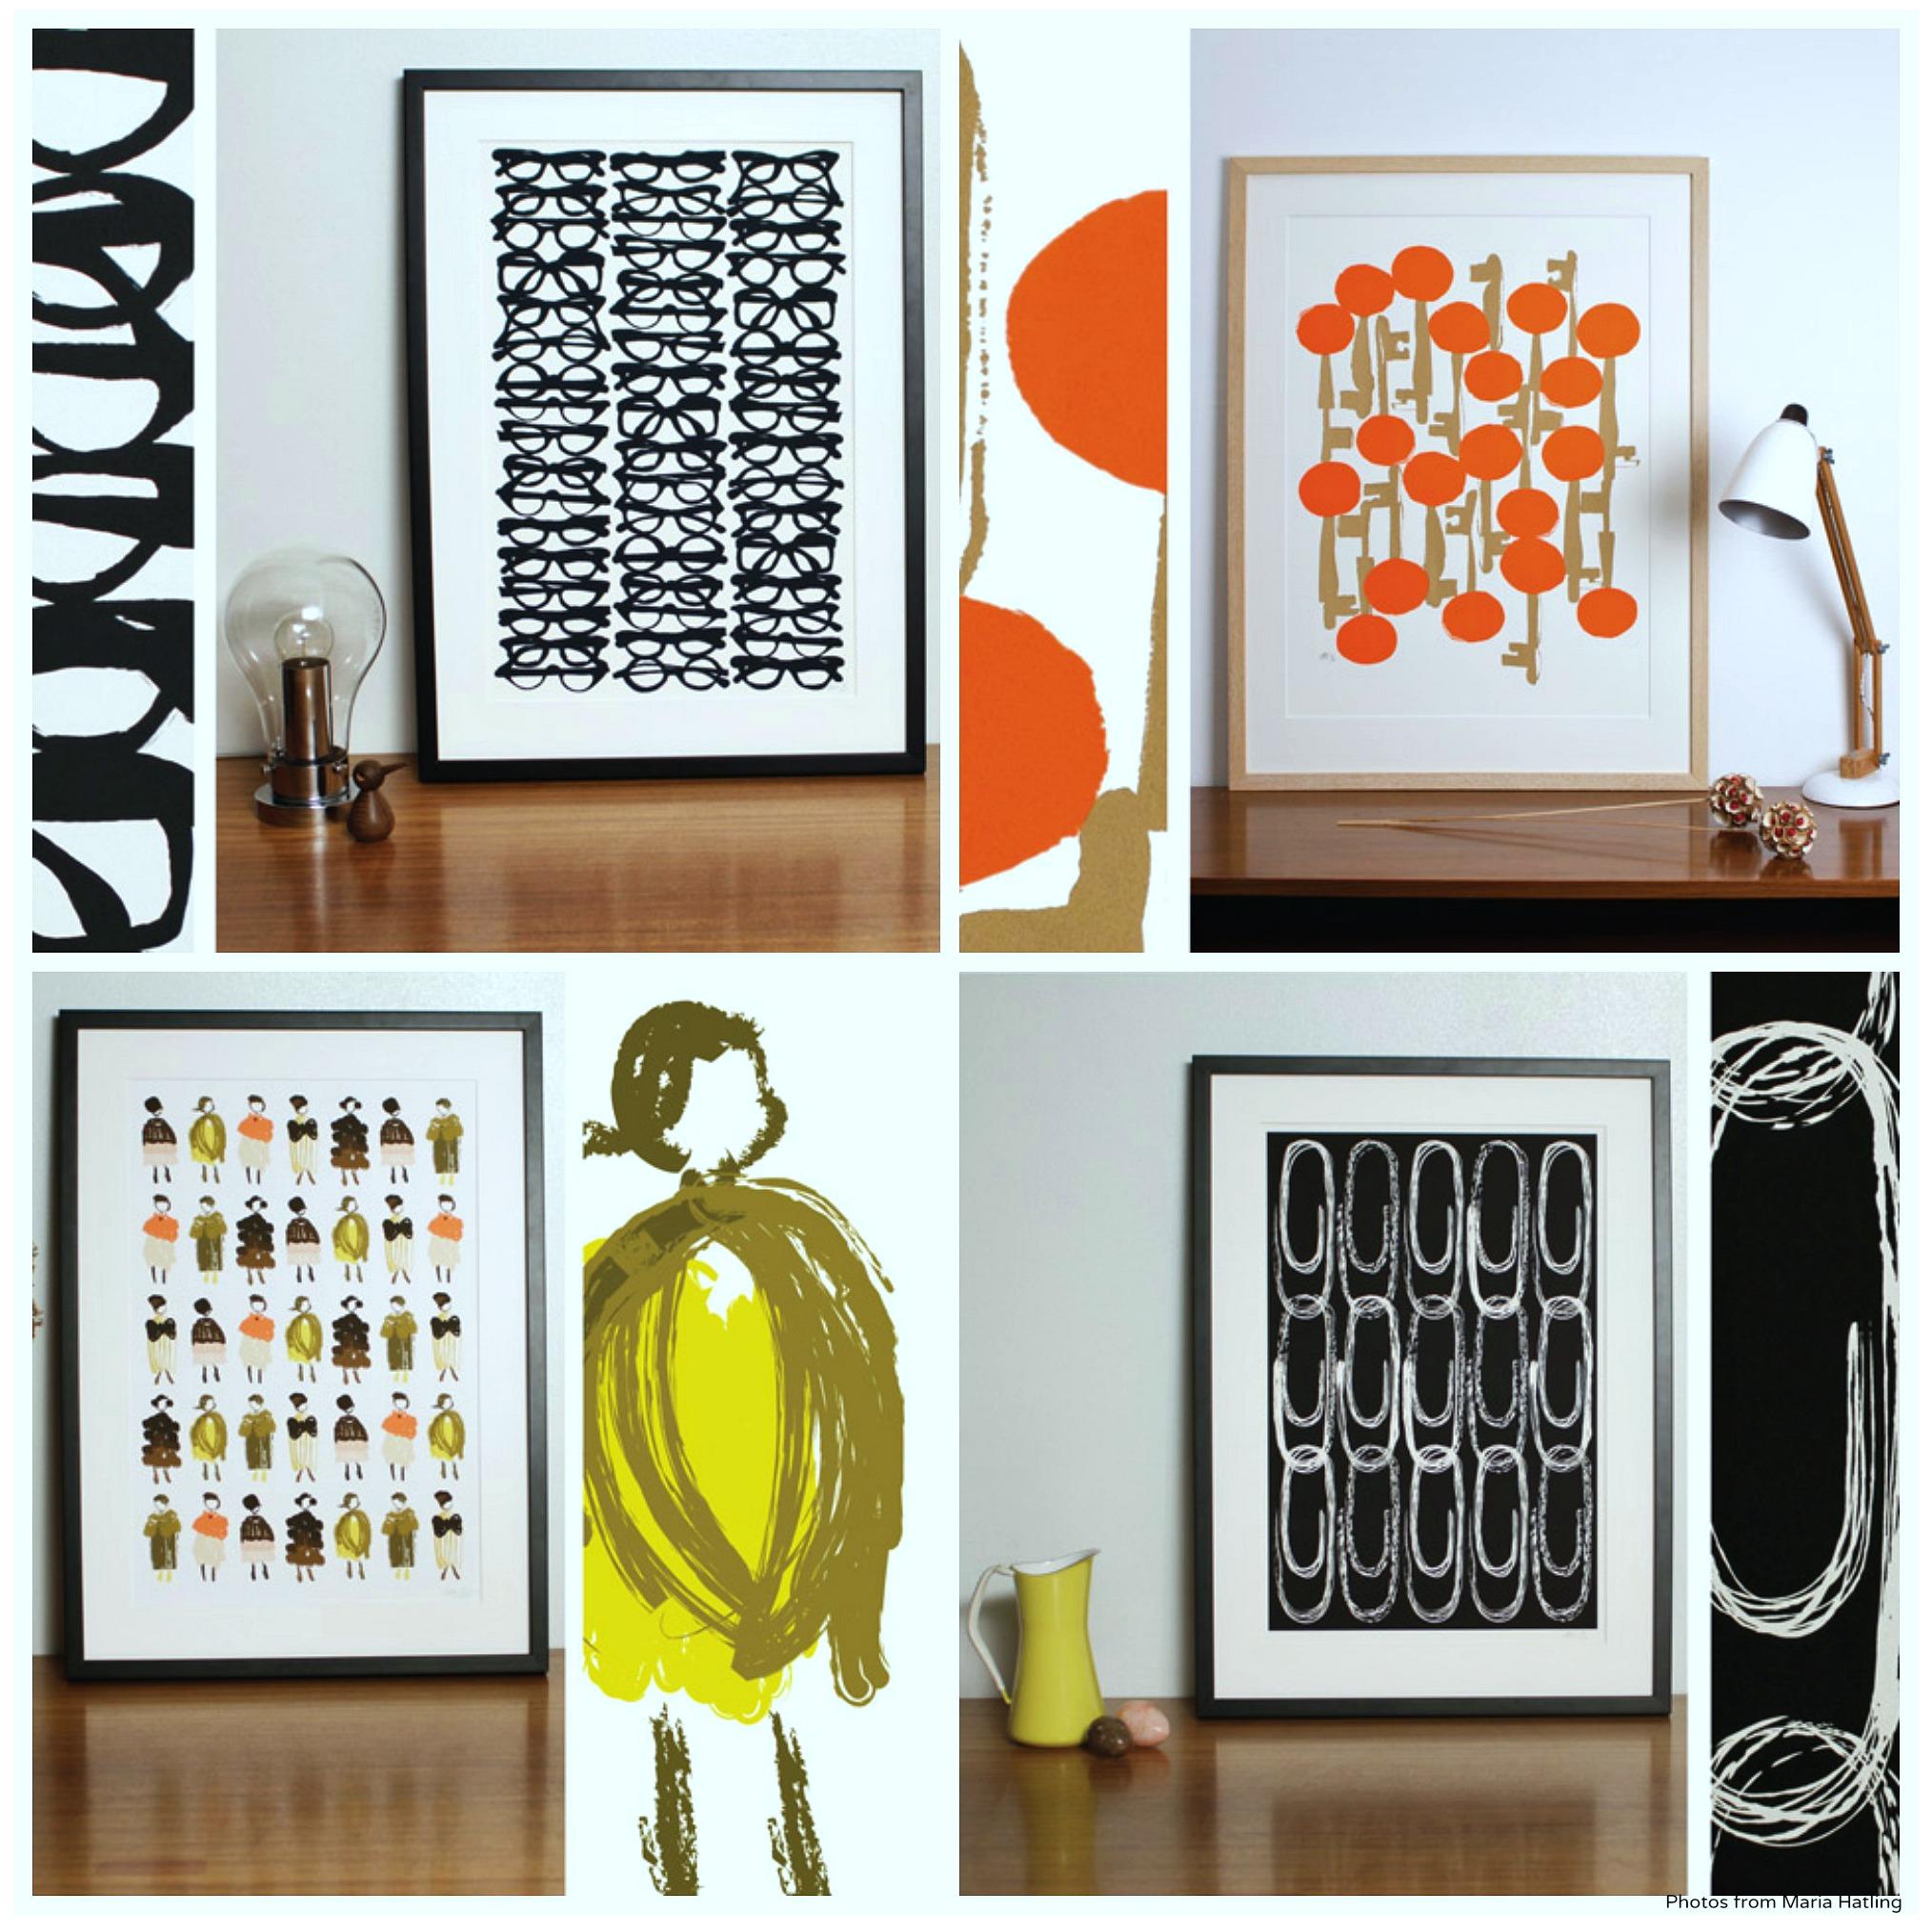 orla kiely papier peint best exceptional papier peint orla kiely with orla kiely papier peint. Black Bedroom Furniture Sets. Home Design Ideas